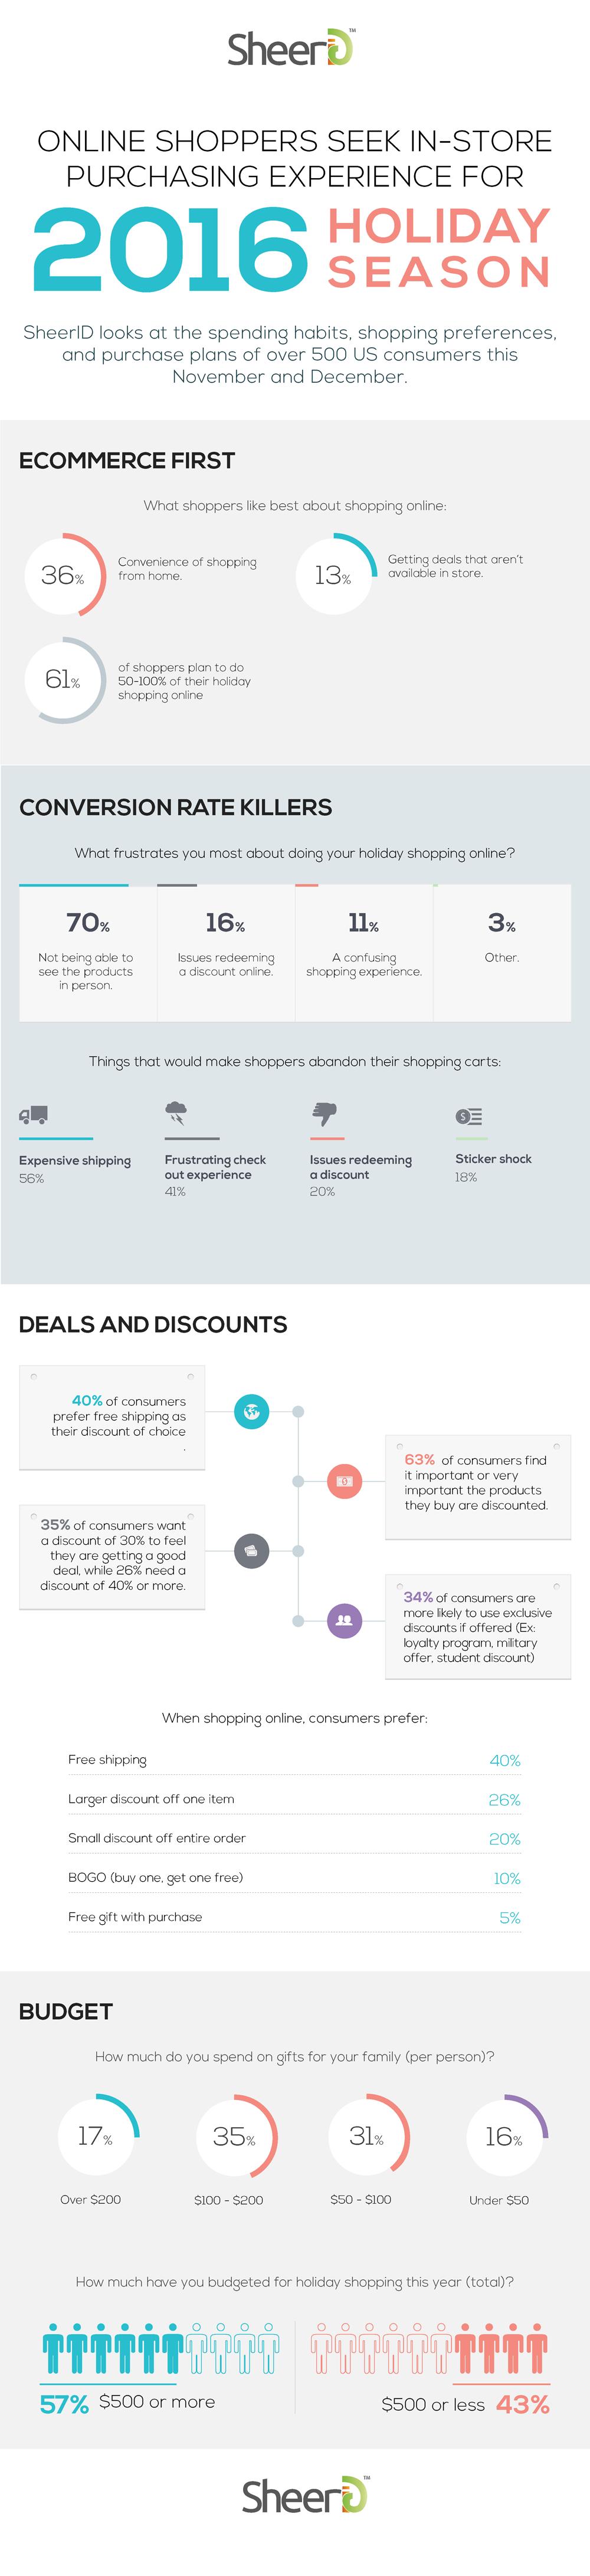 SheerID 2016 holiday shopping infographic